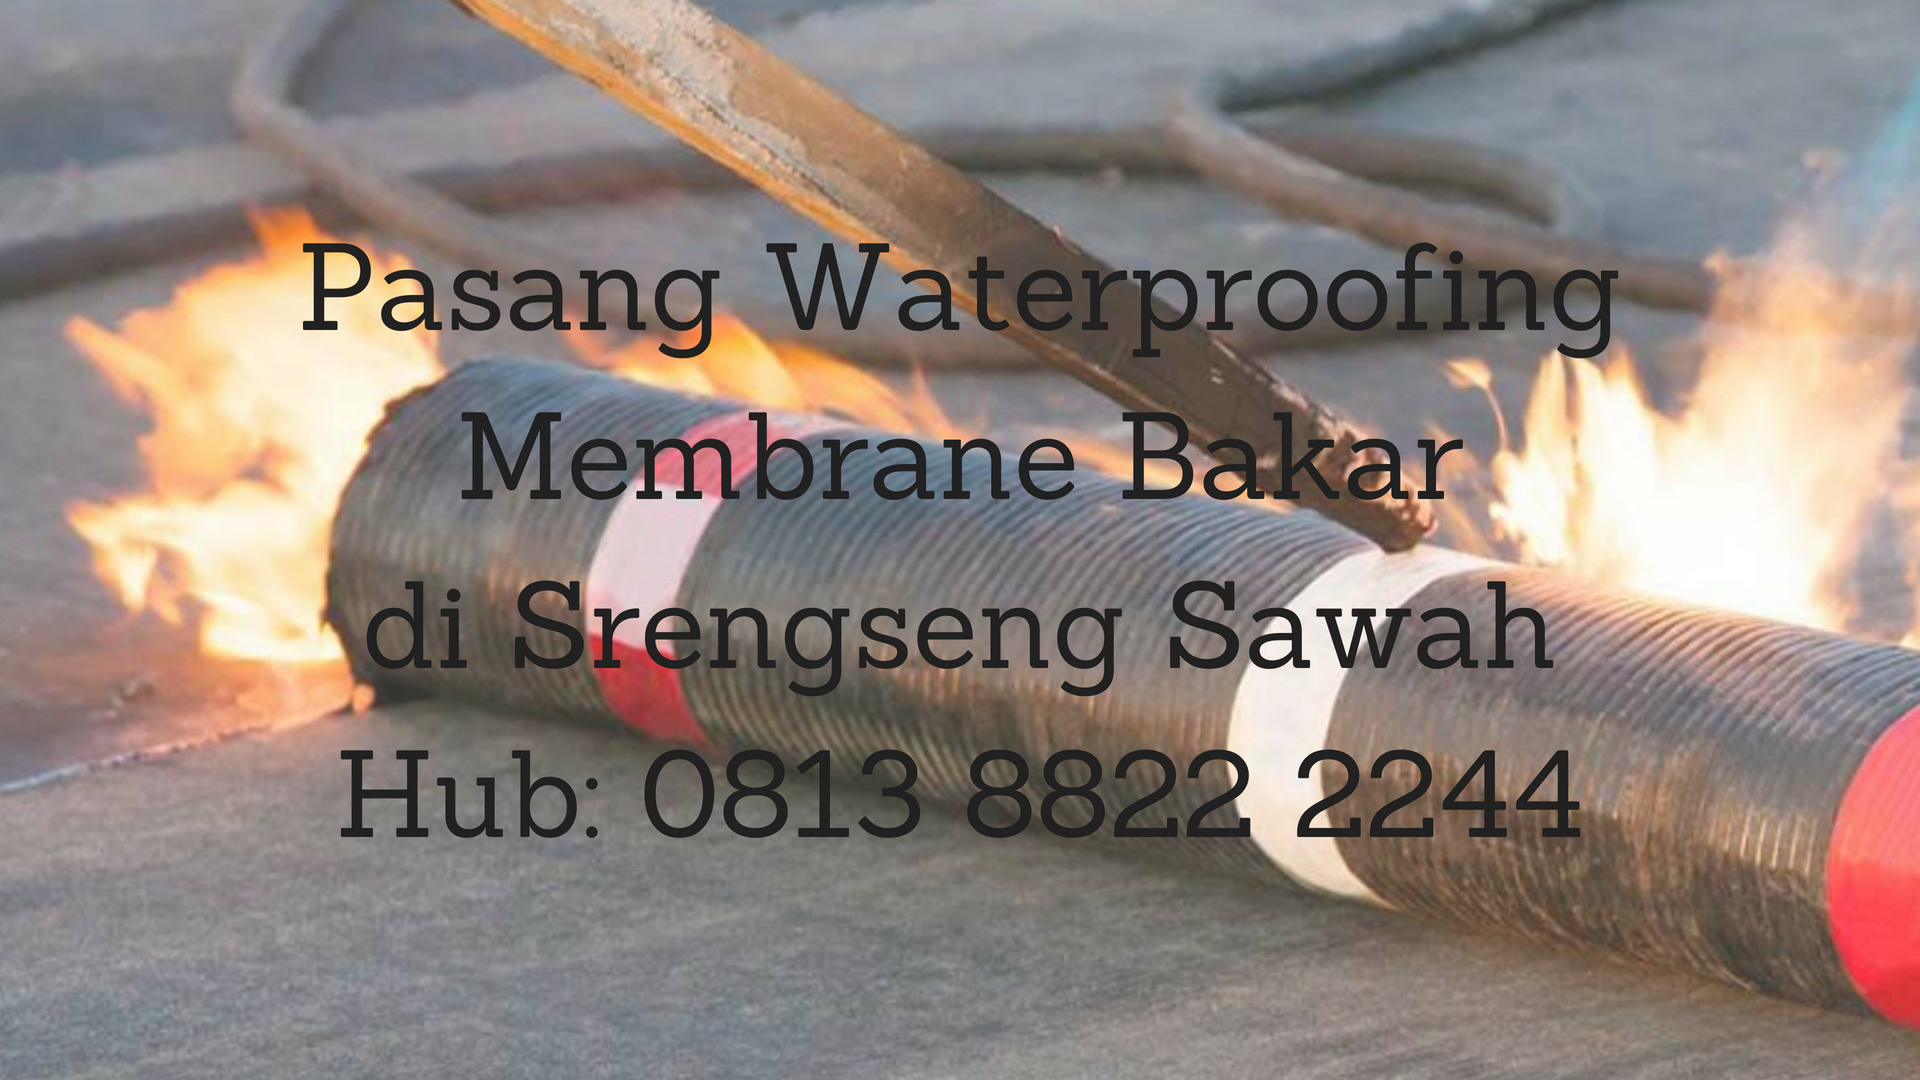 PASANG WATERPROOFING MEMBRANE BAKAR DI SRENGSENG SAWAH.  HUB : 08138822 2244